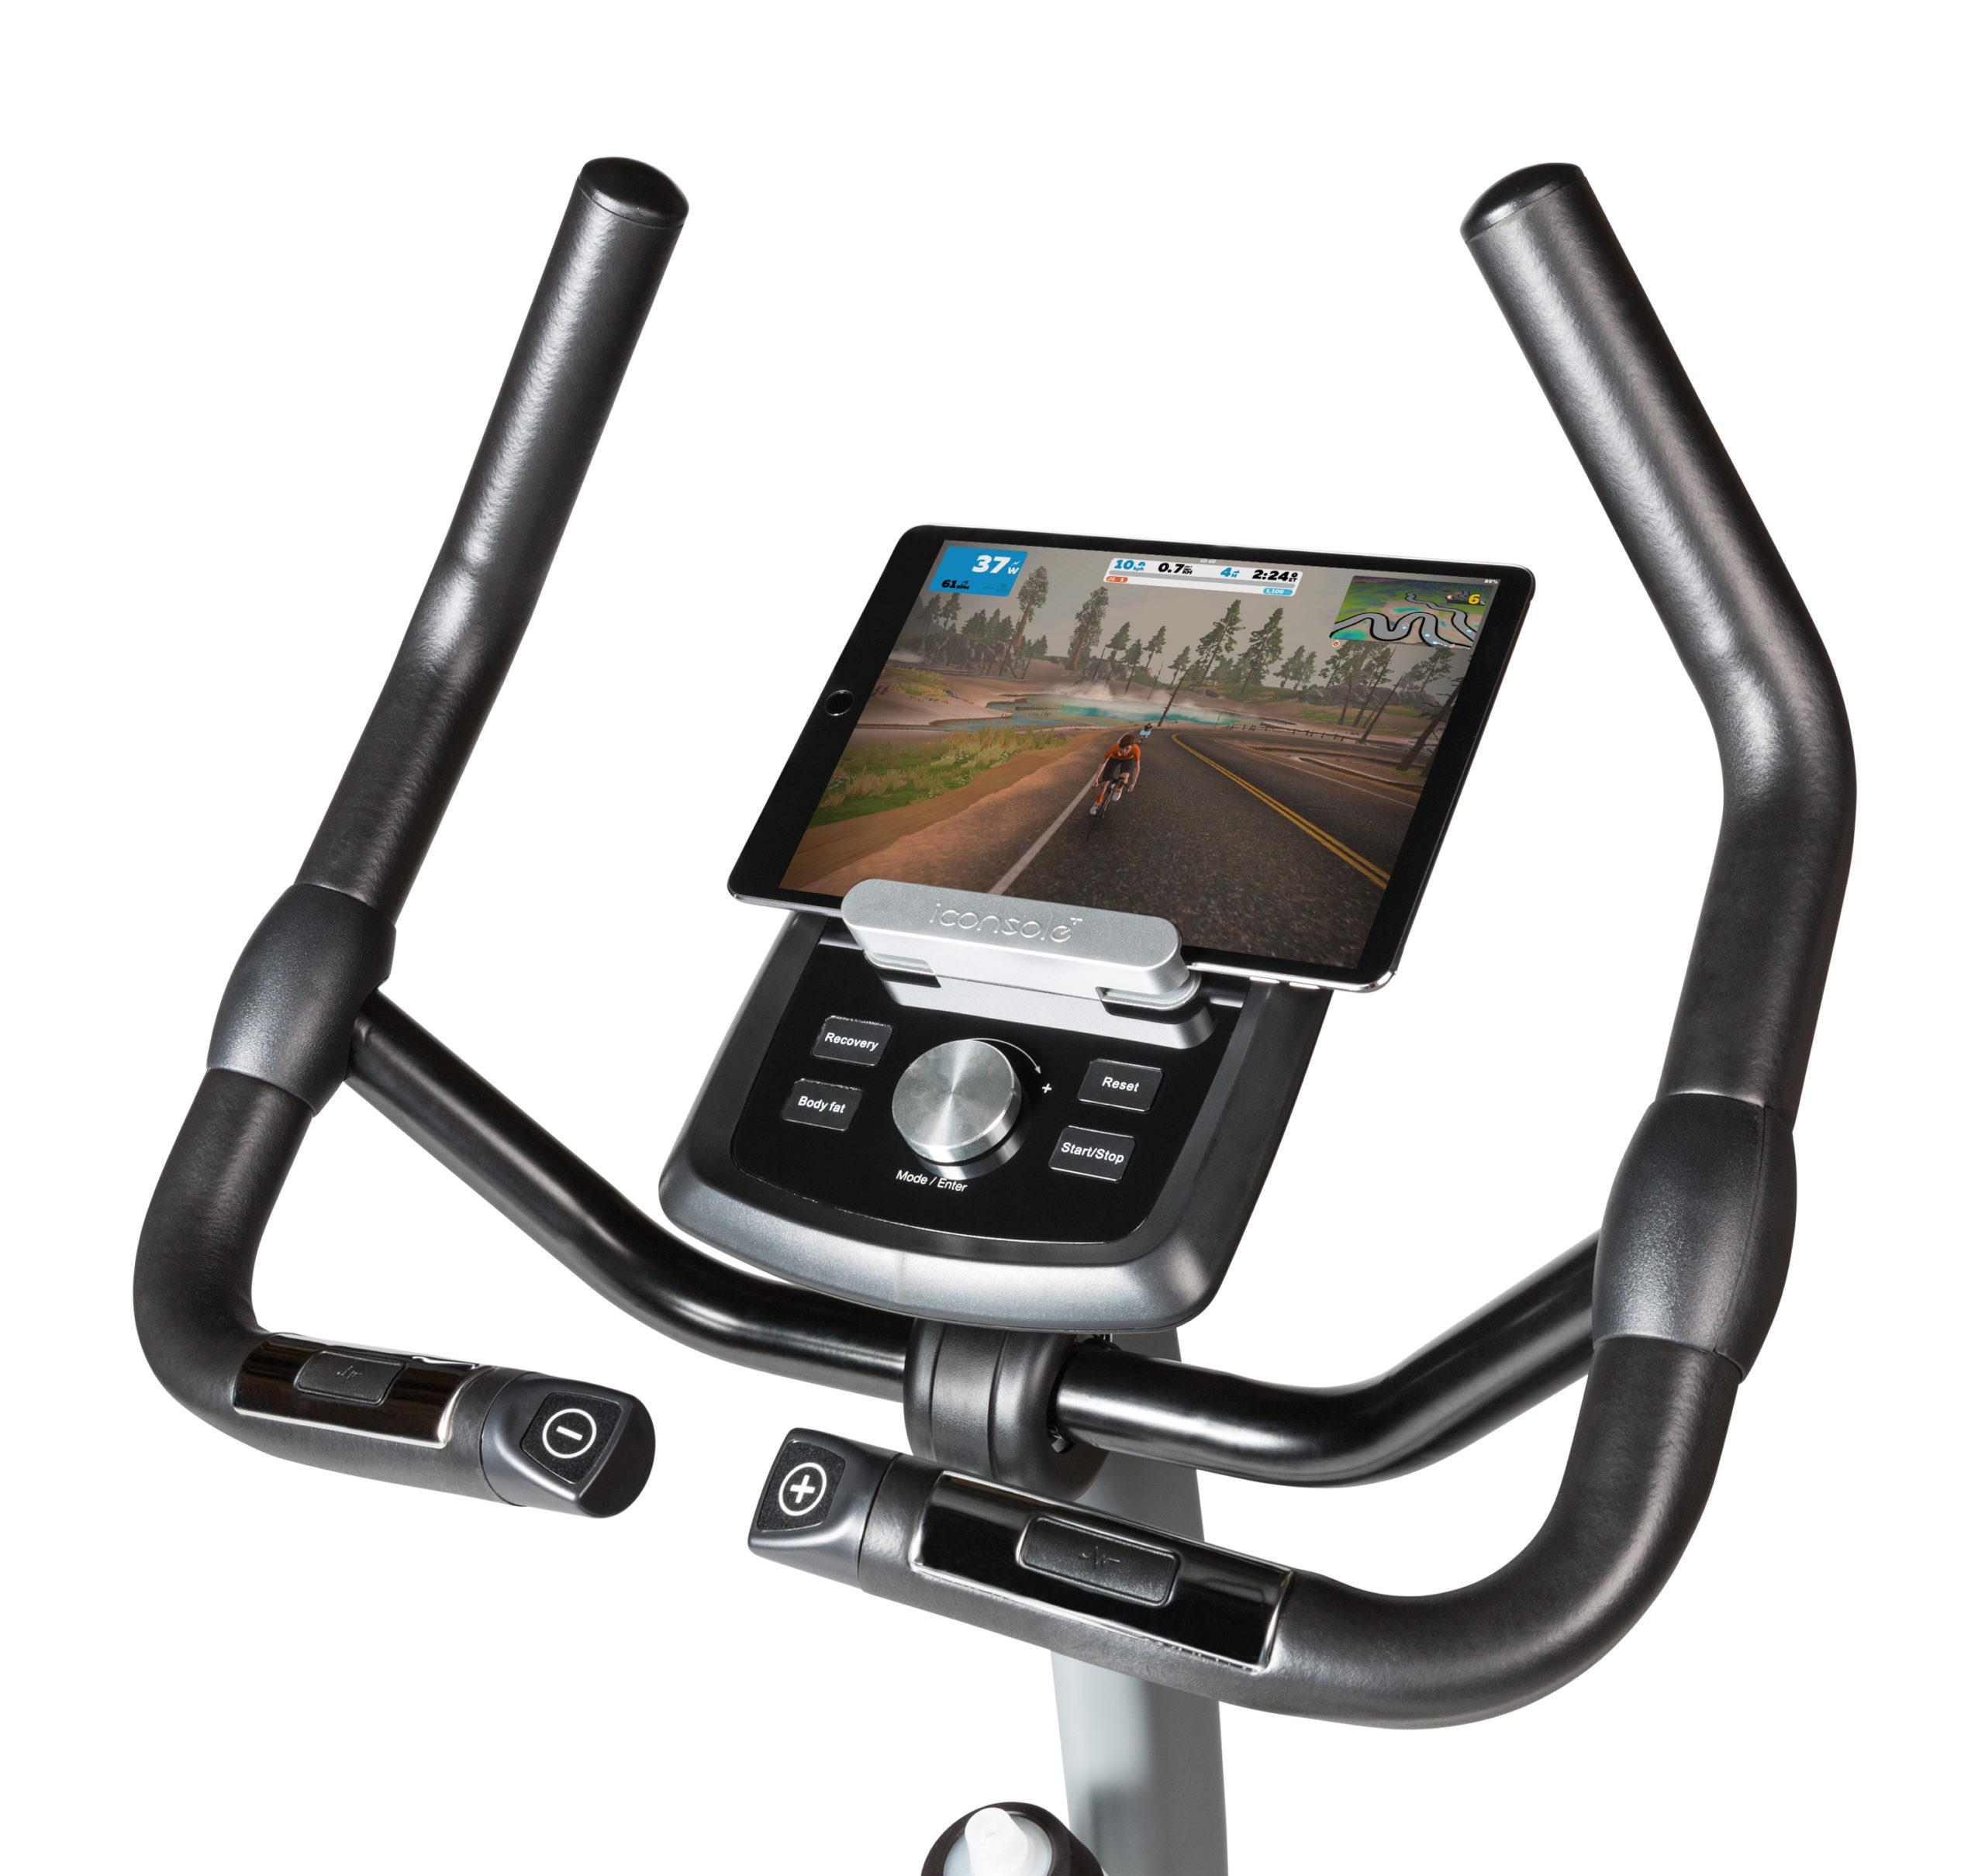 Flow Fitness Tabel Turner DHT2000i Hometrainer 17